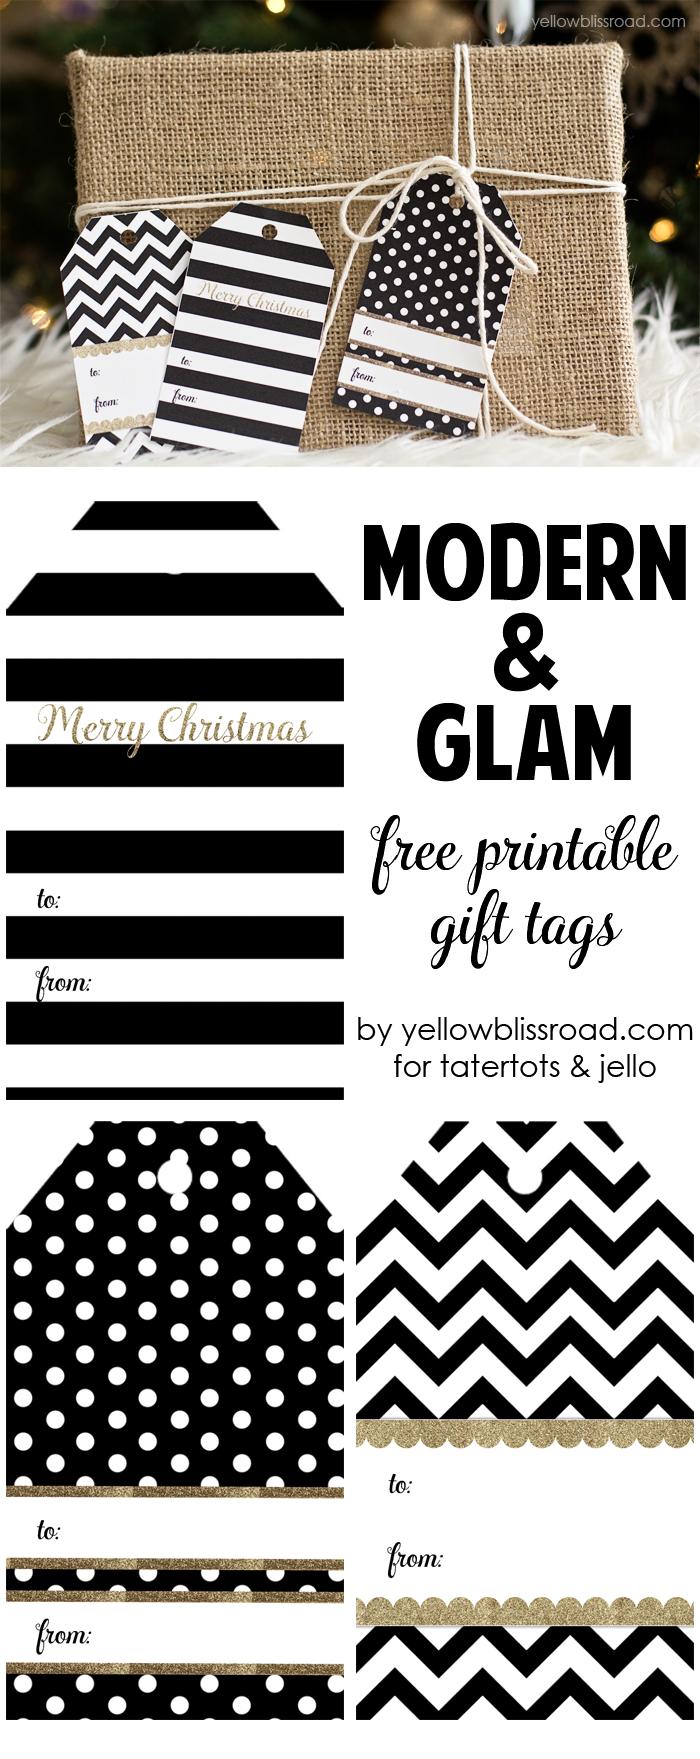 Moder Glam Free Printable Gift Tags